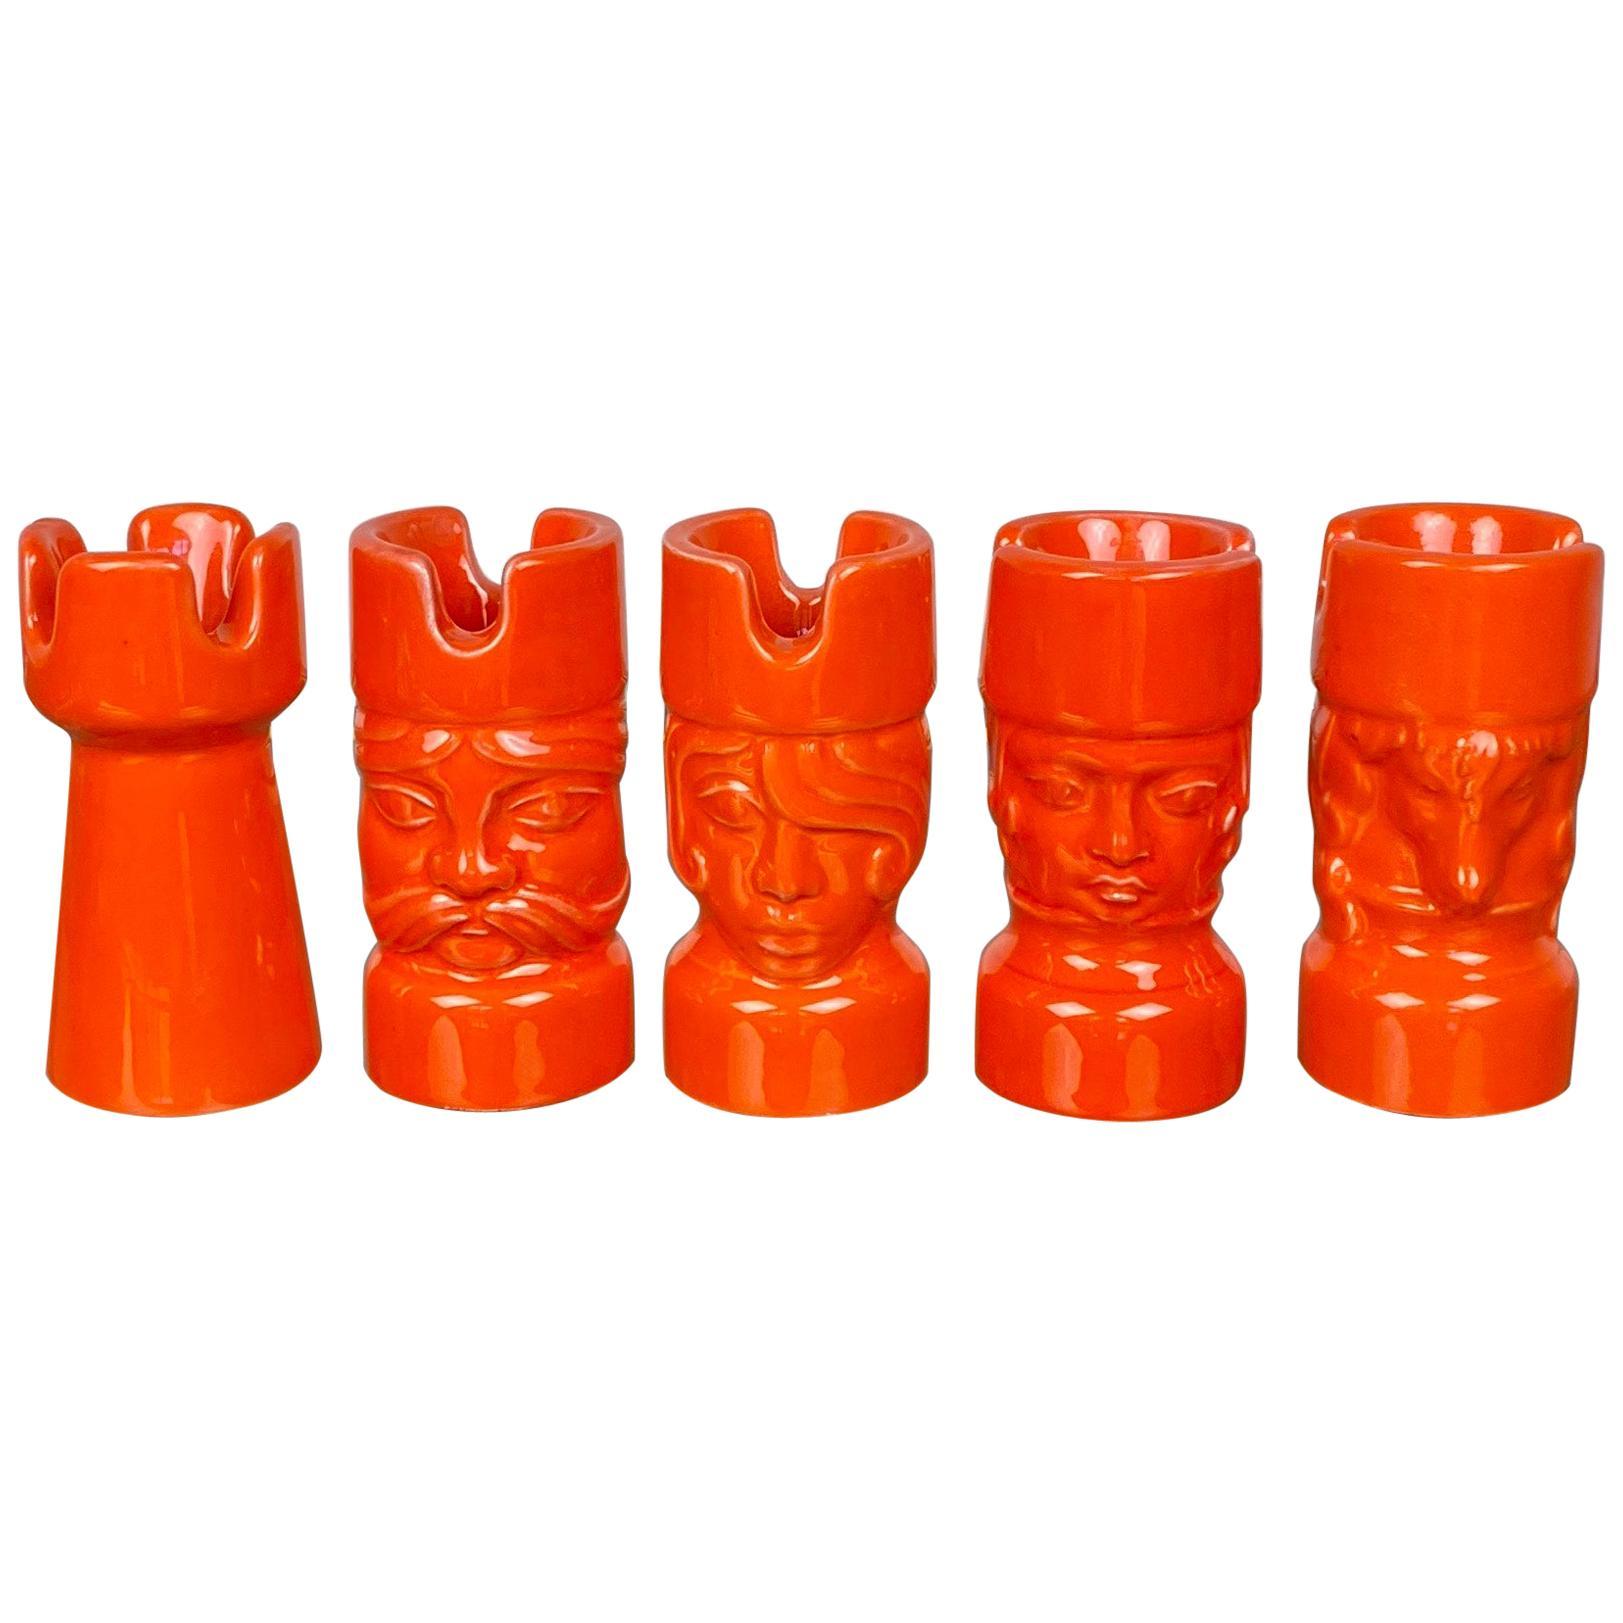 Orange Ceramic Chess Pieces Sculpture by Il Picchio, Italy, 1970s